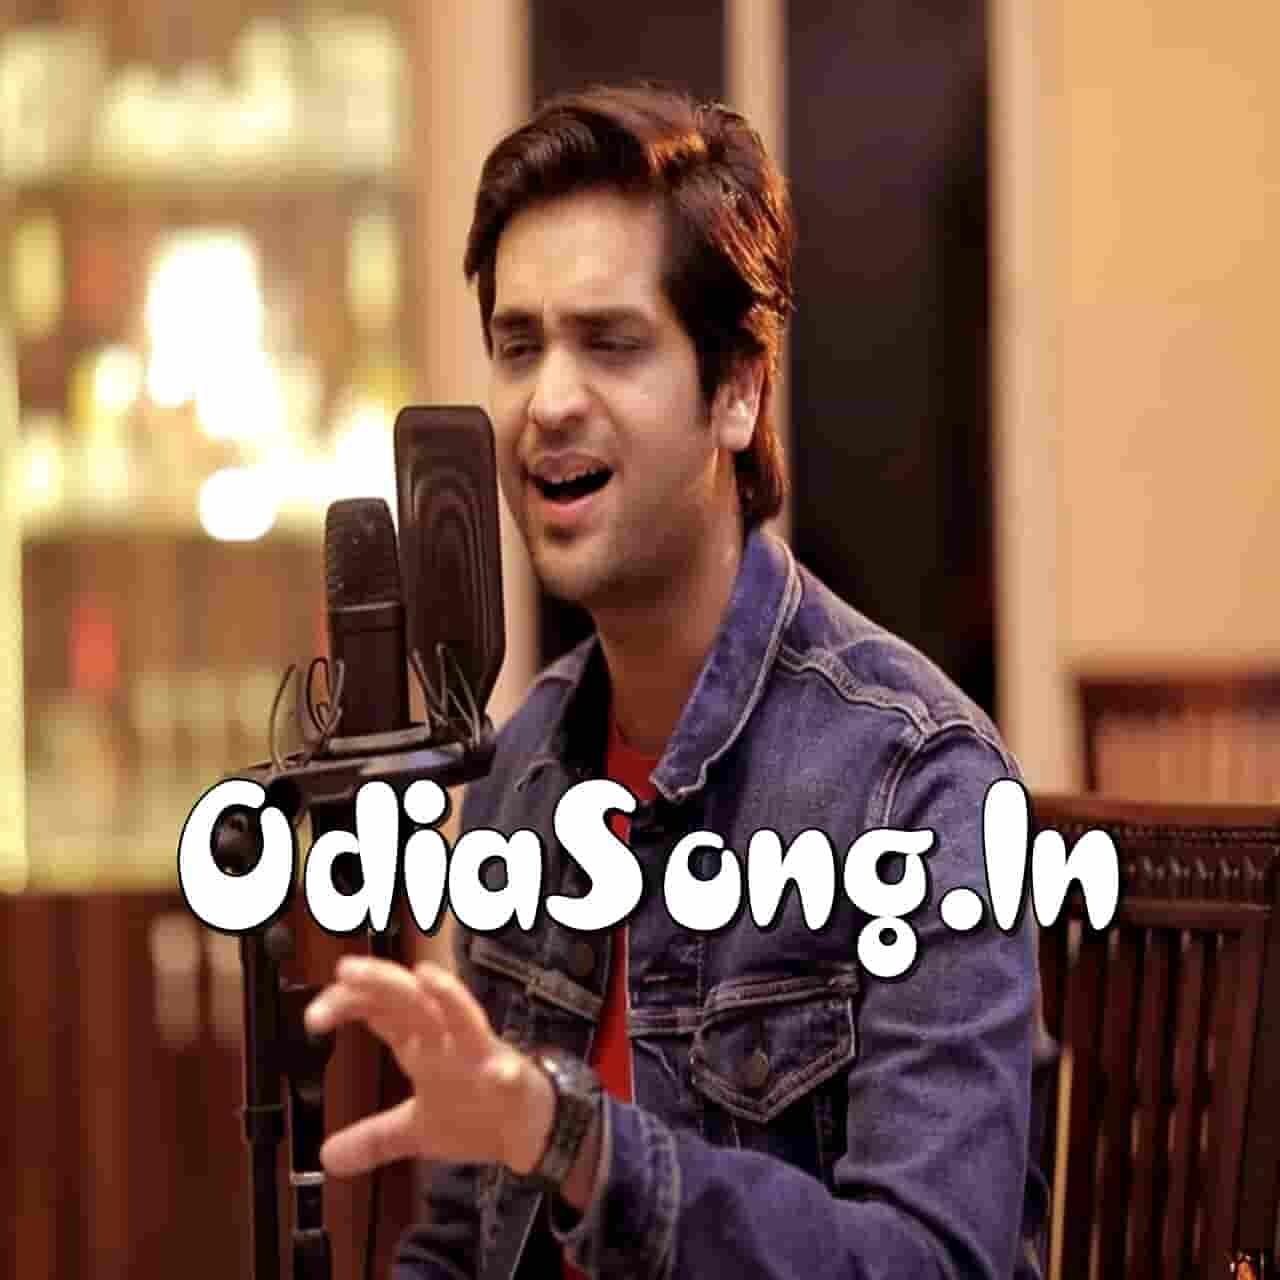 TO PREMA BARBAD KALA - ODIA SAD SONG BY SWAYAM